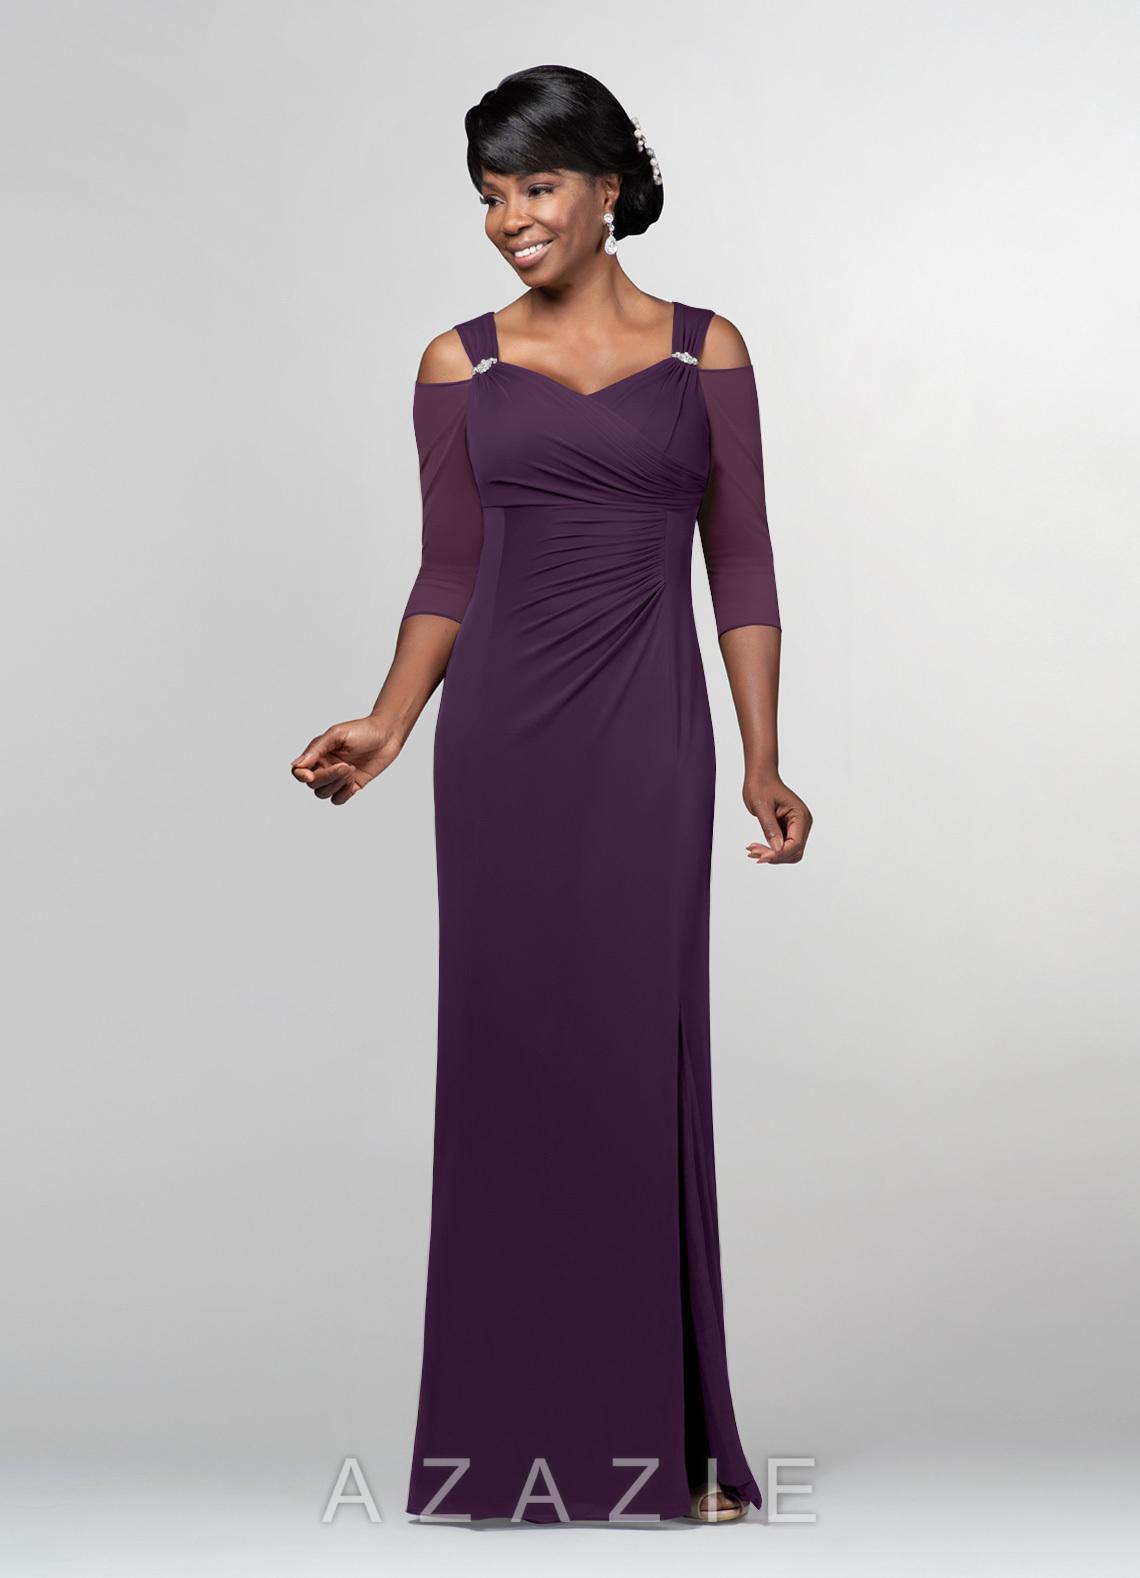 711835de Azazie Zara MBD Mother Of The Bride Dress | Azazie